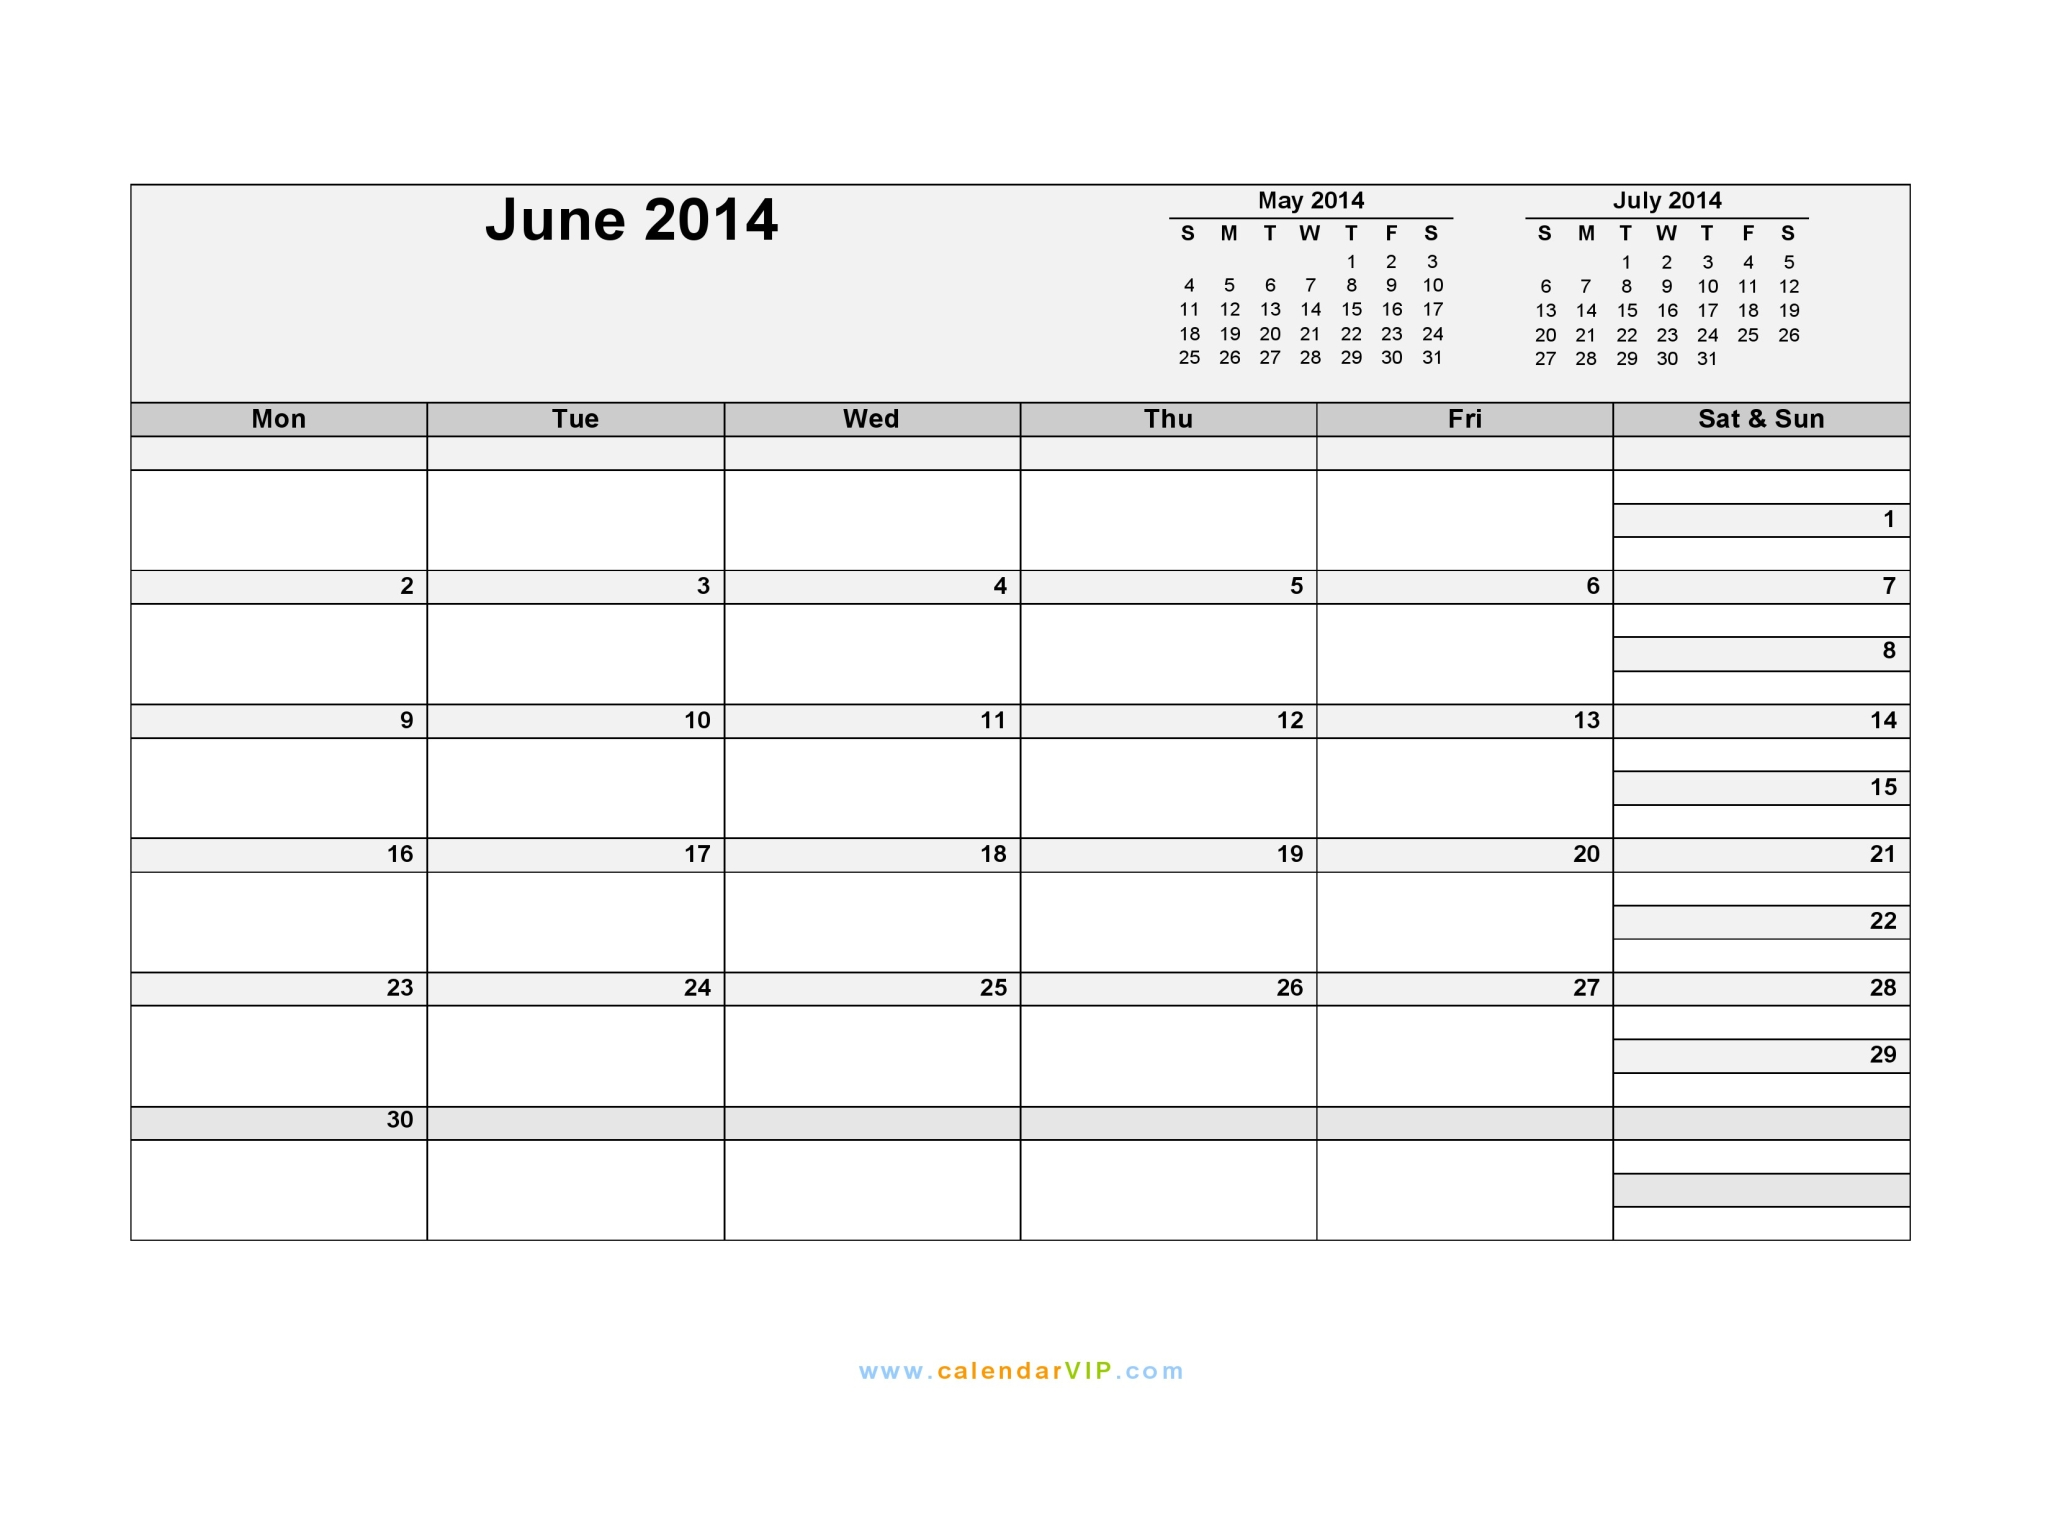 ms office calendar template 2014 - microsoft word june 2014 calendar freeloadagents